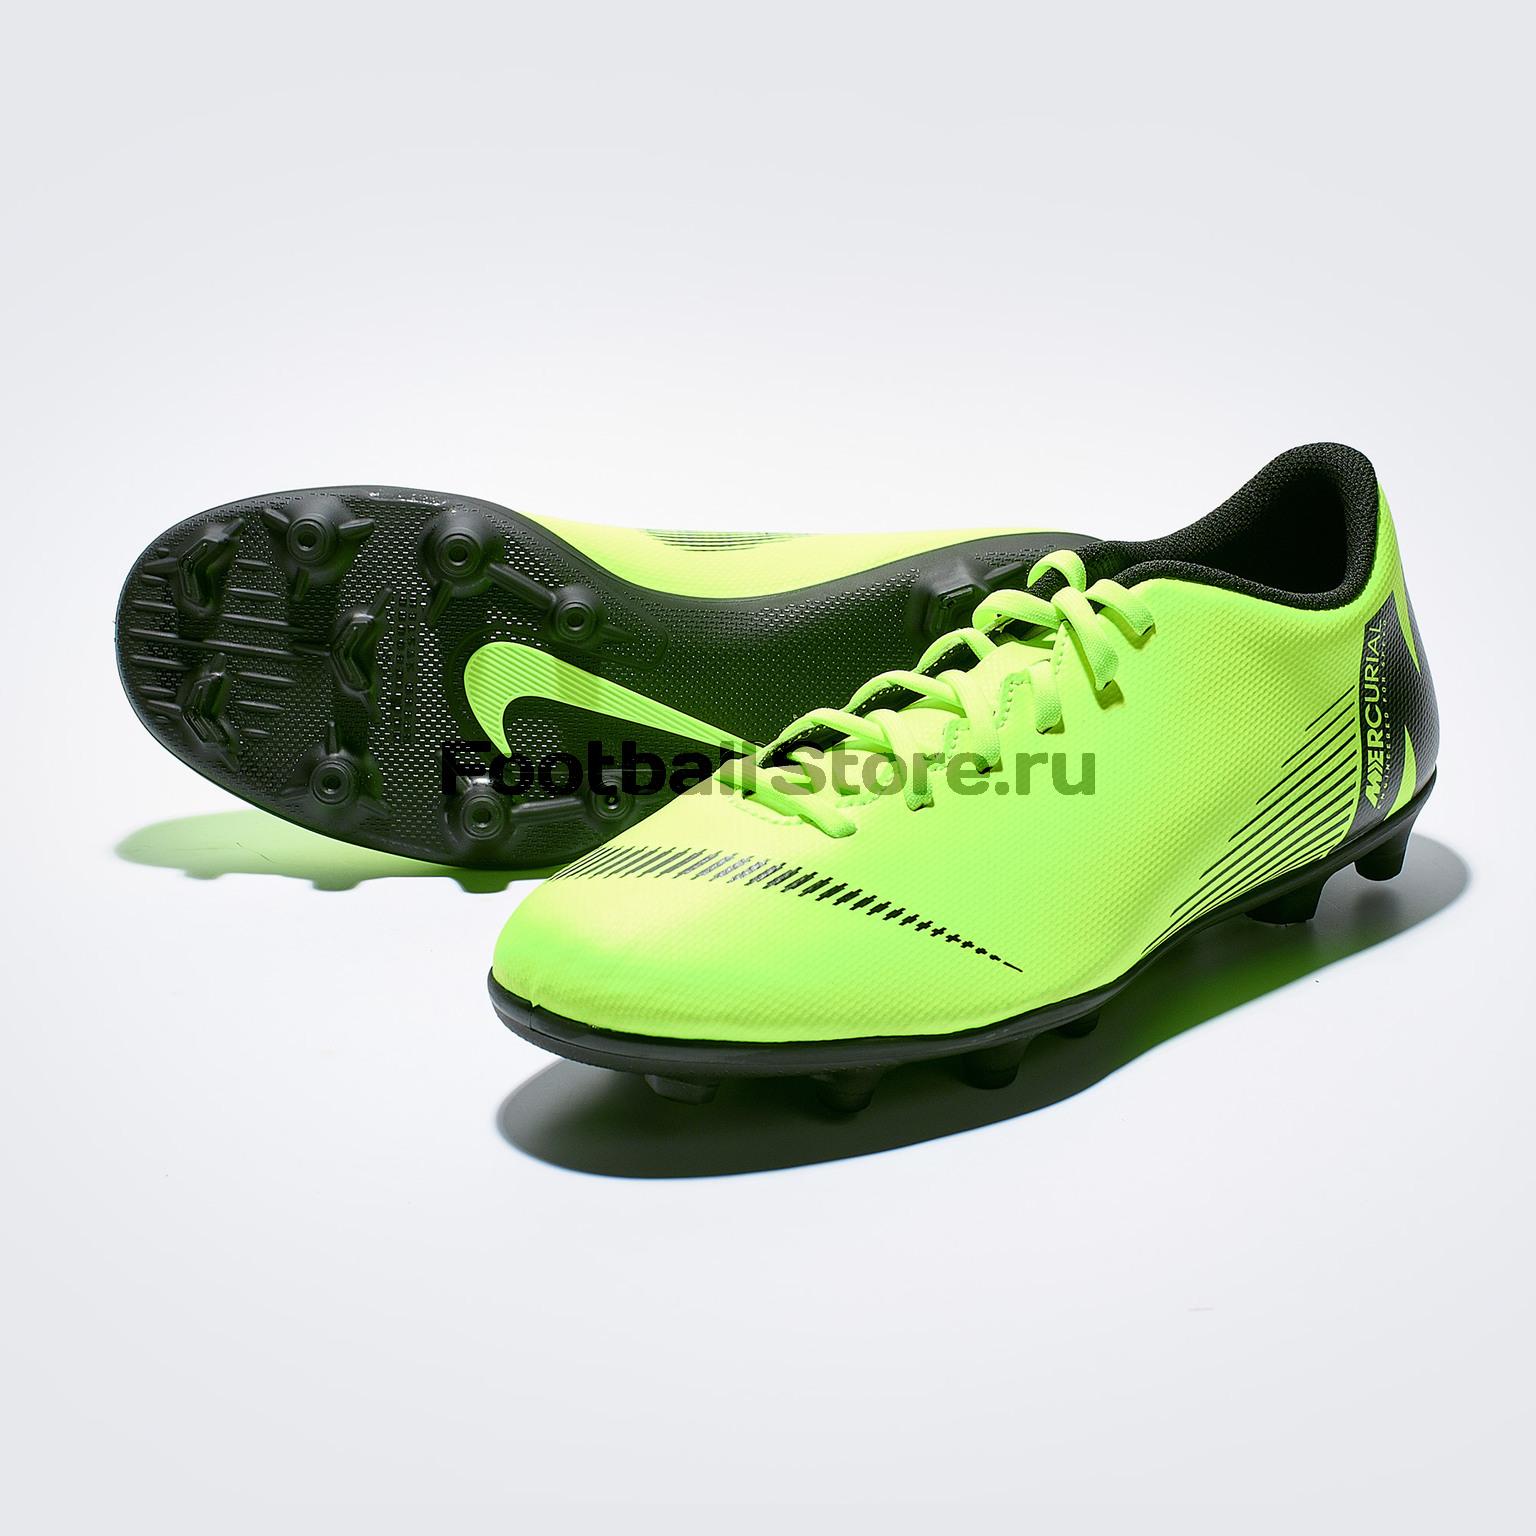 Бутсы Nike Vapor 12 Club FG/MG AH7378-701 бутсы nike mercurial victory iii fg 509128 800